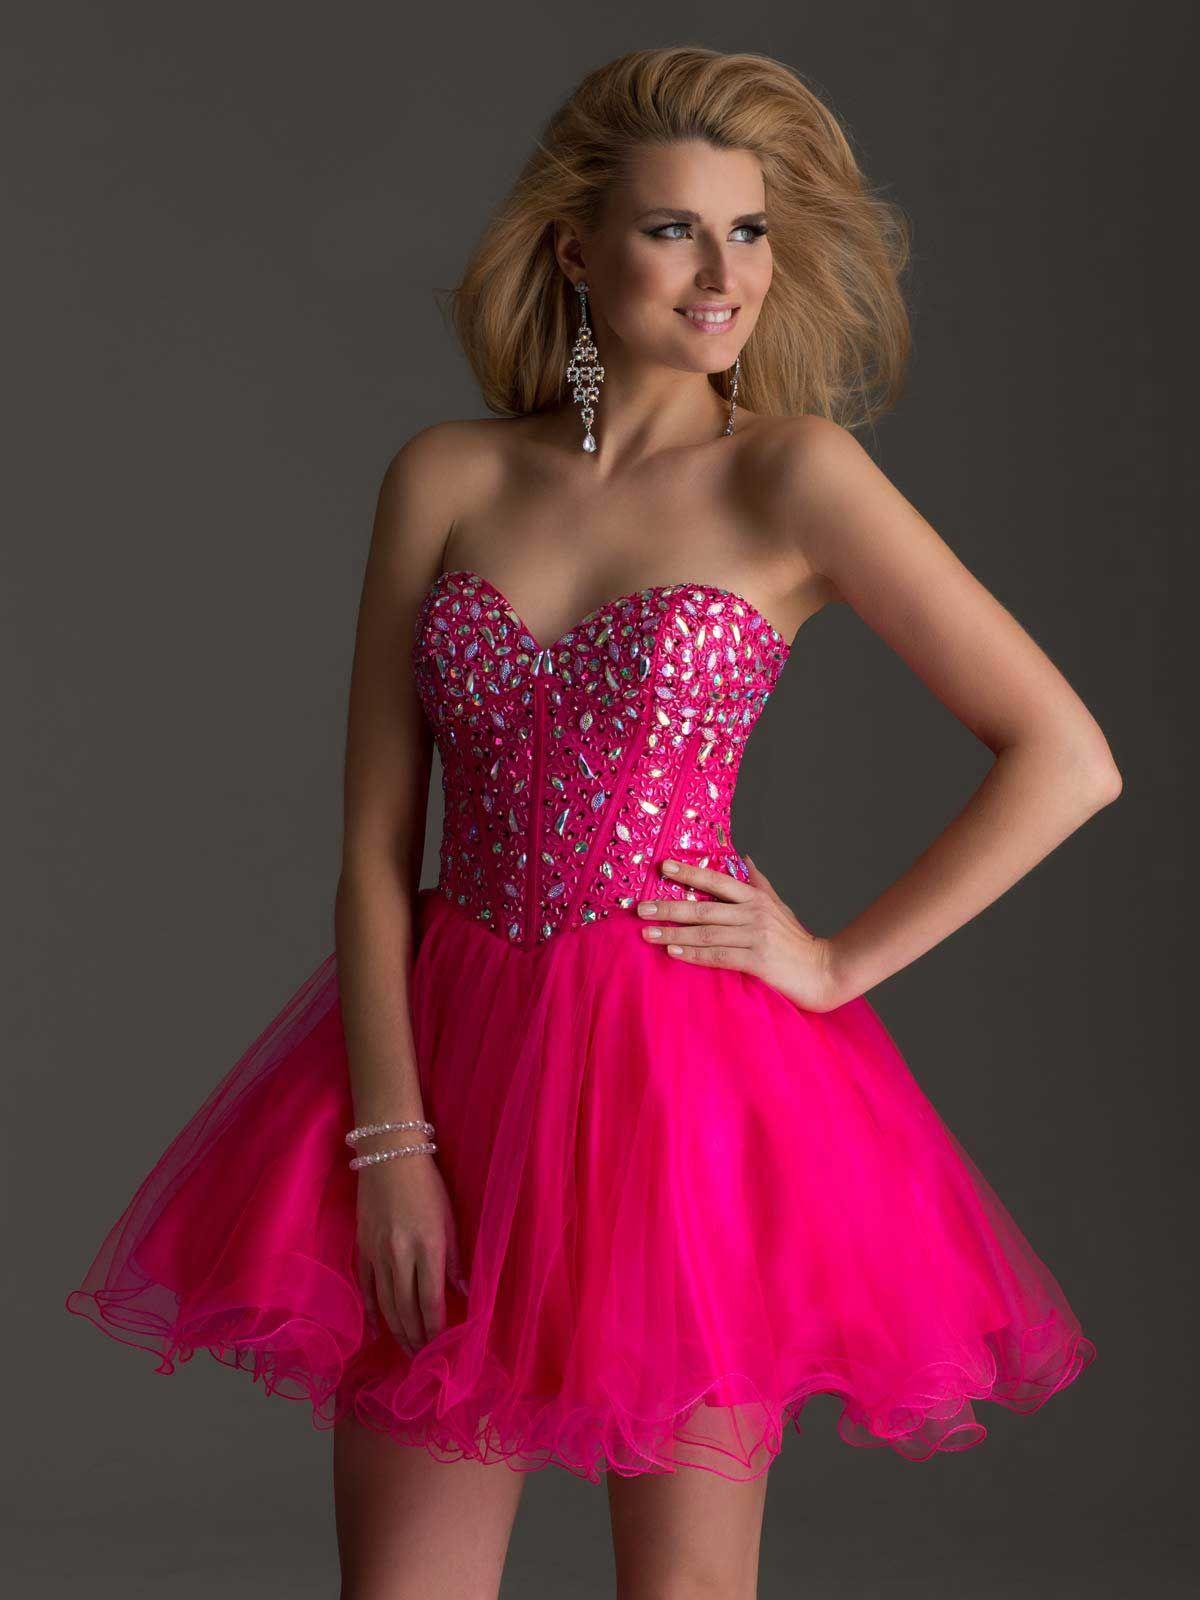 2461 Clarisse Homecoming Dress | Short homecoming dresses ...